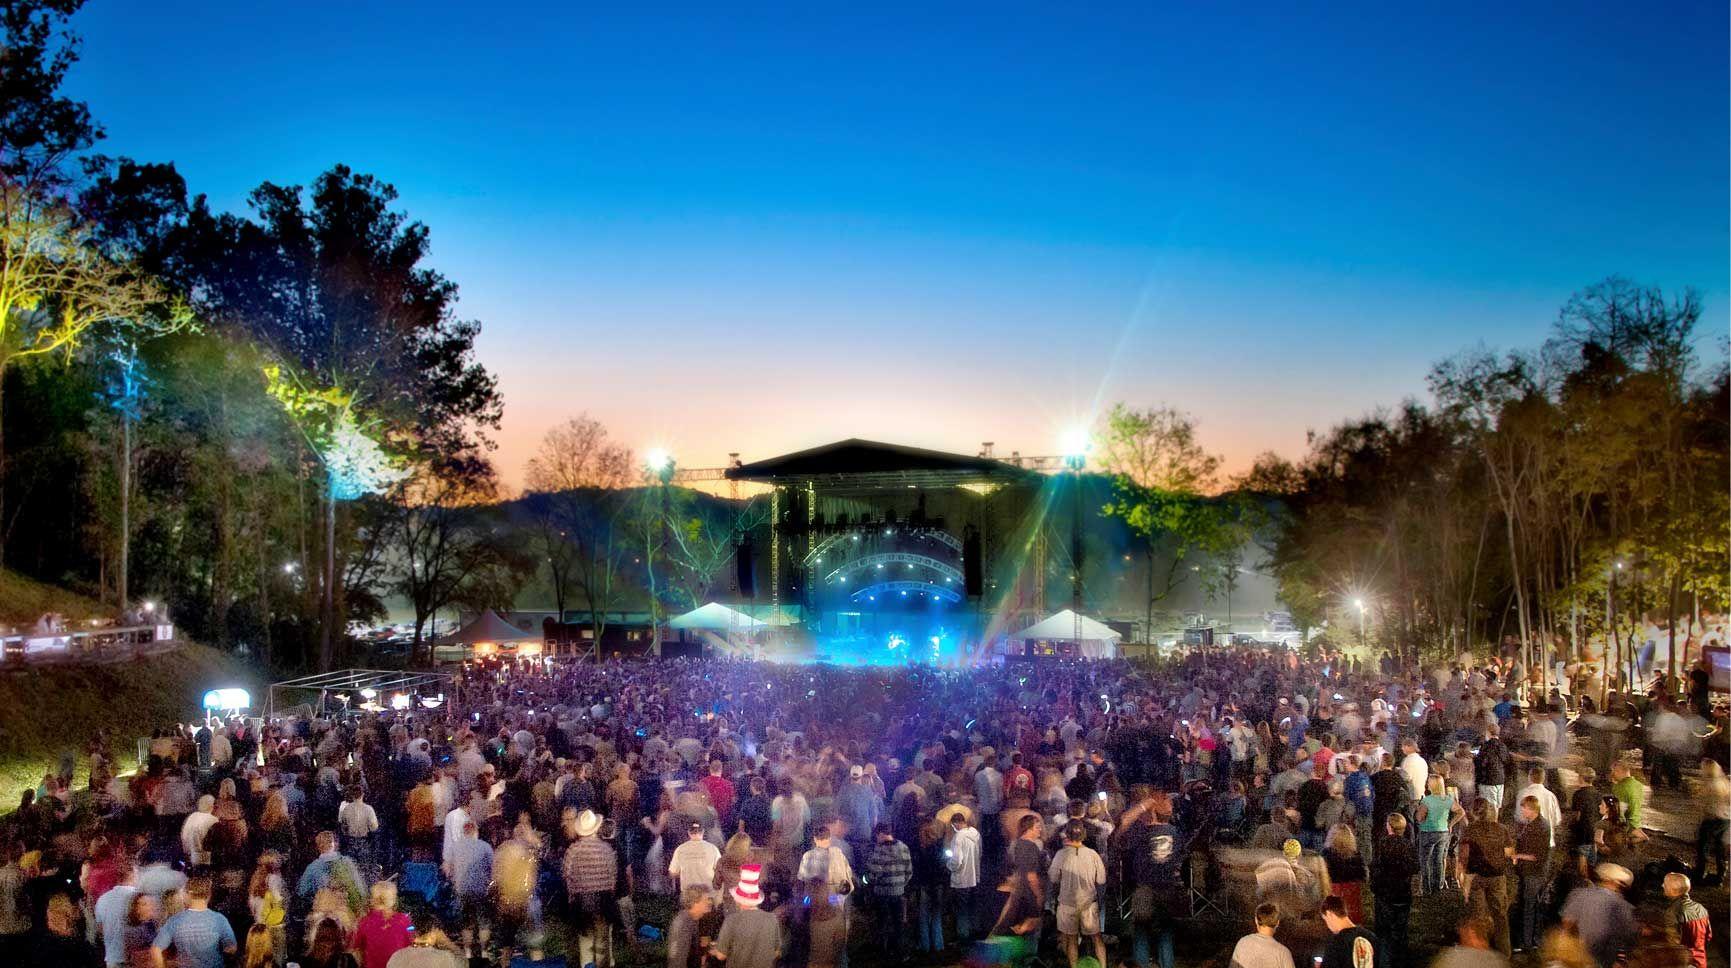 Great concert venue just outside of Nashville the Woods